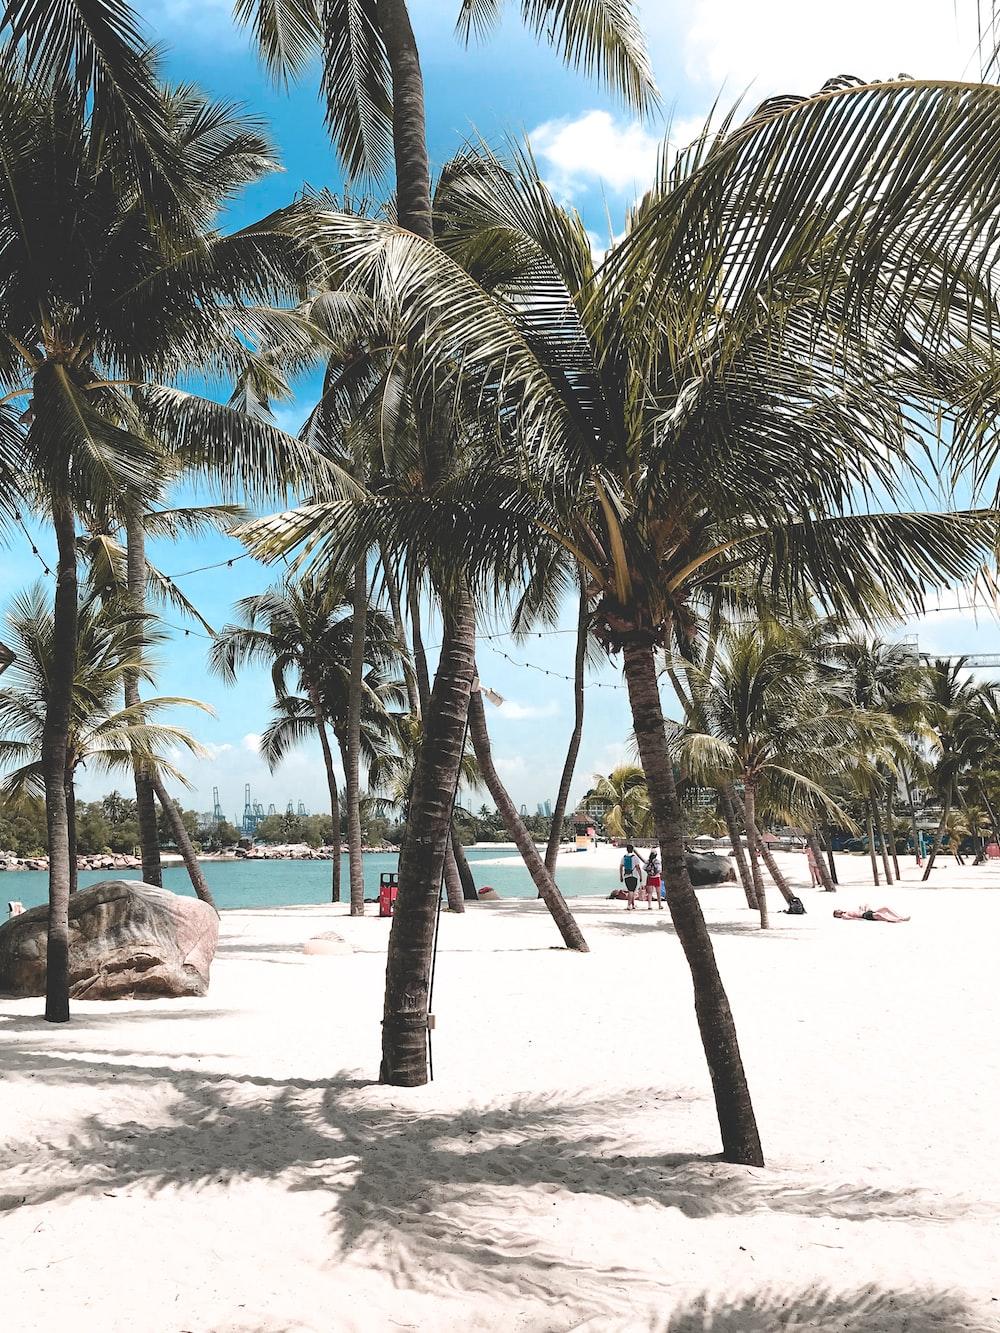 coconut tress on sand